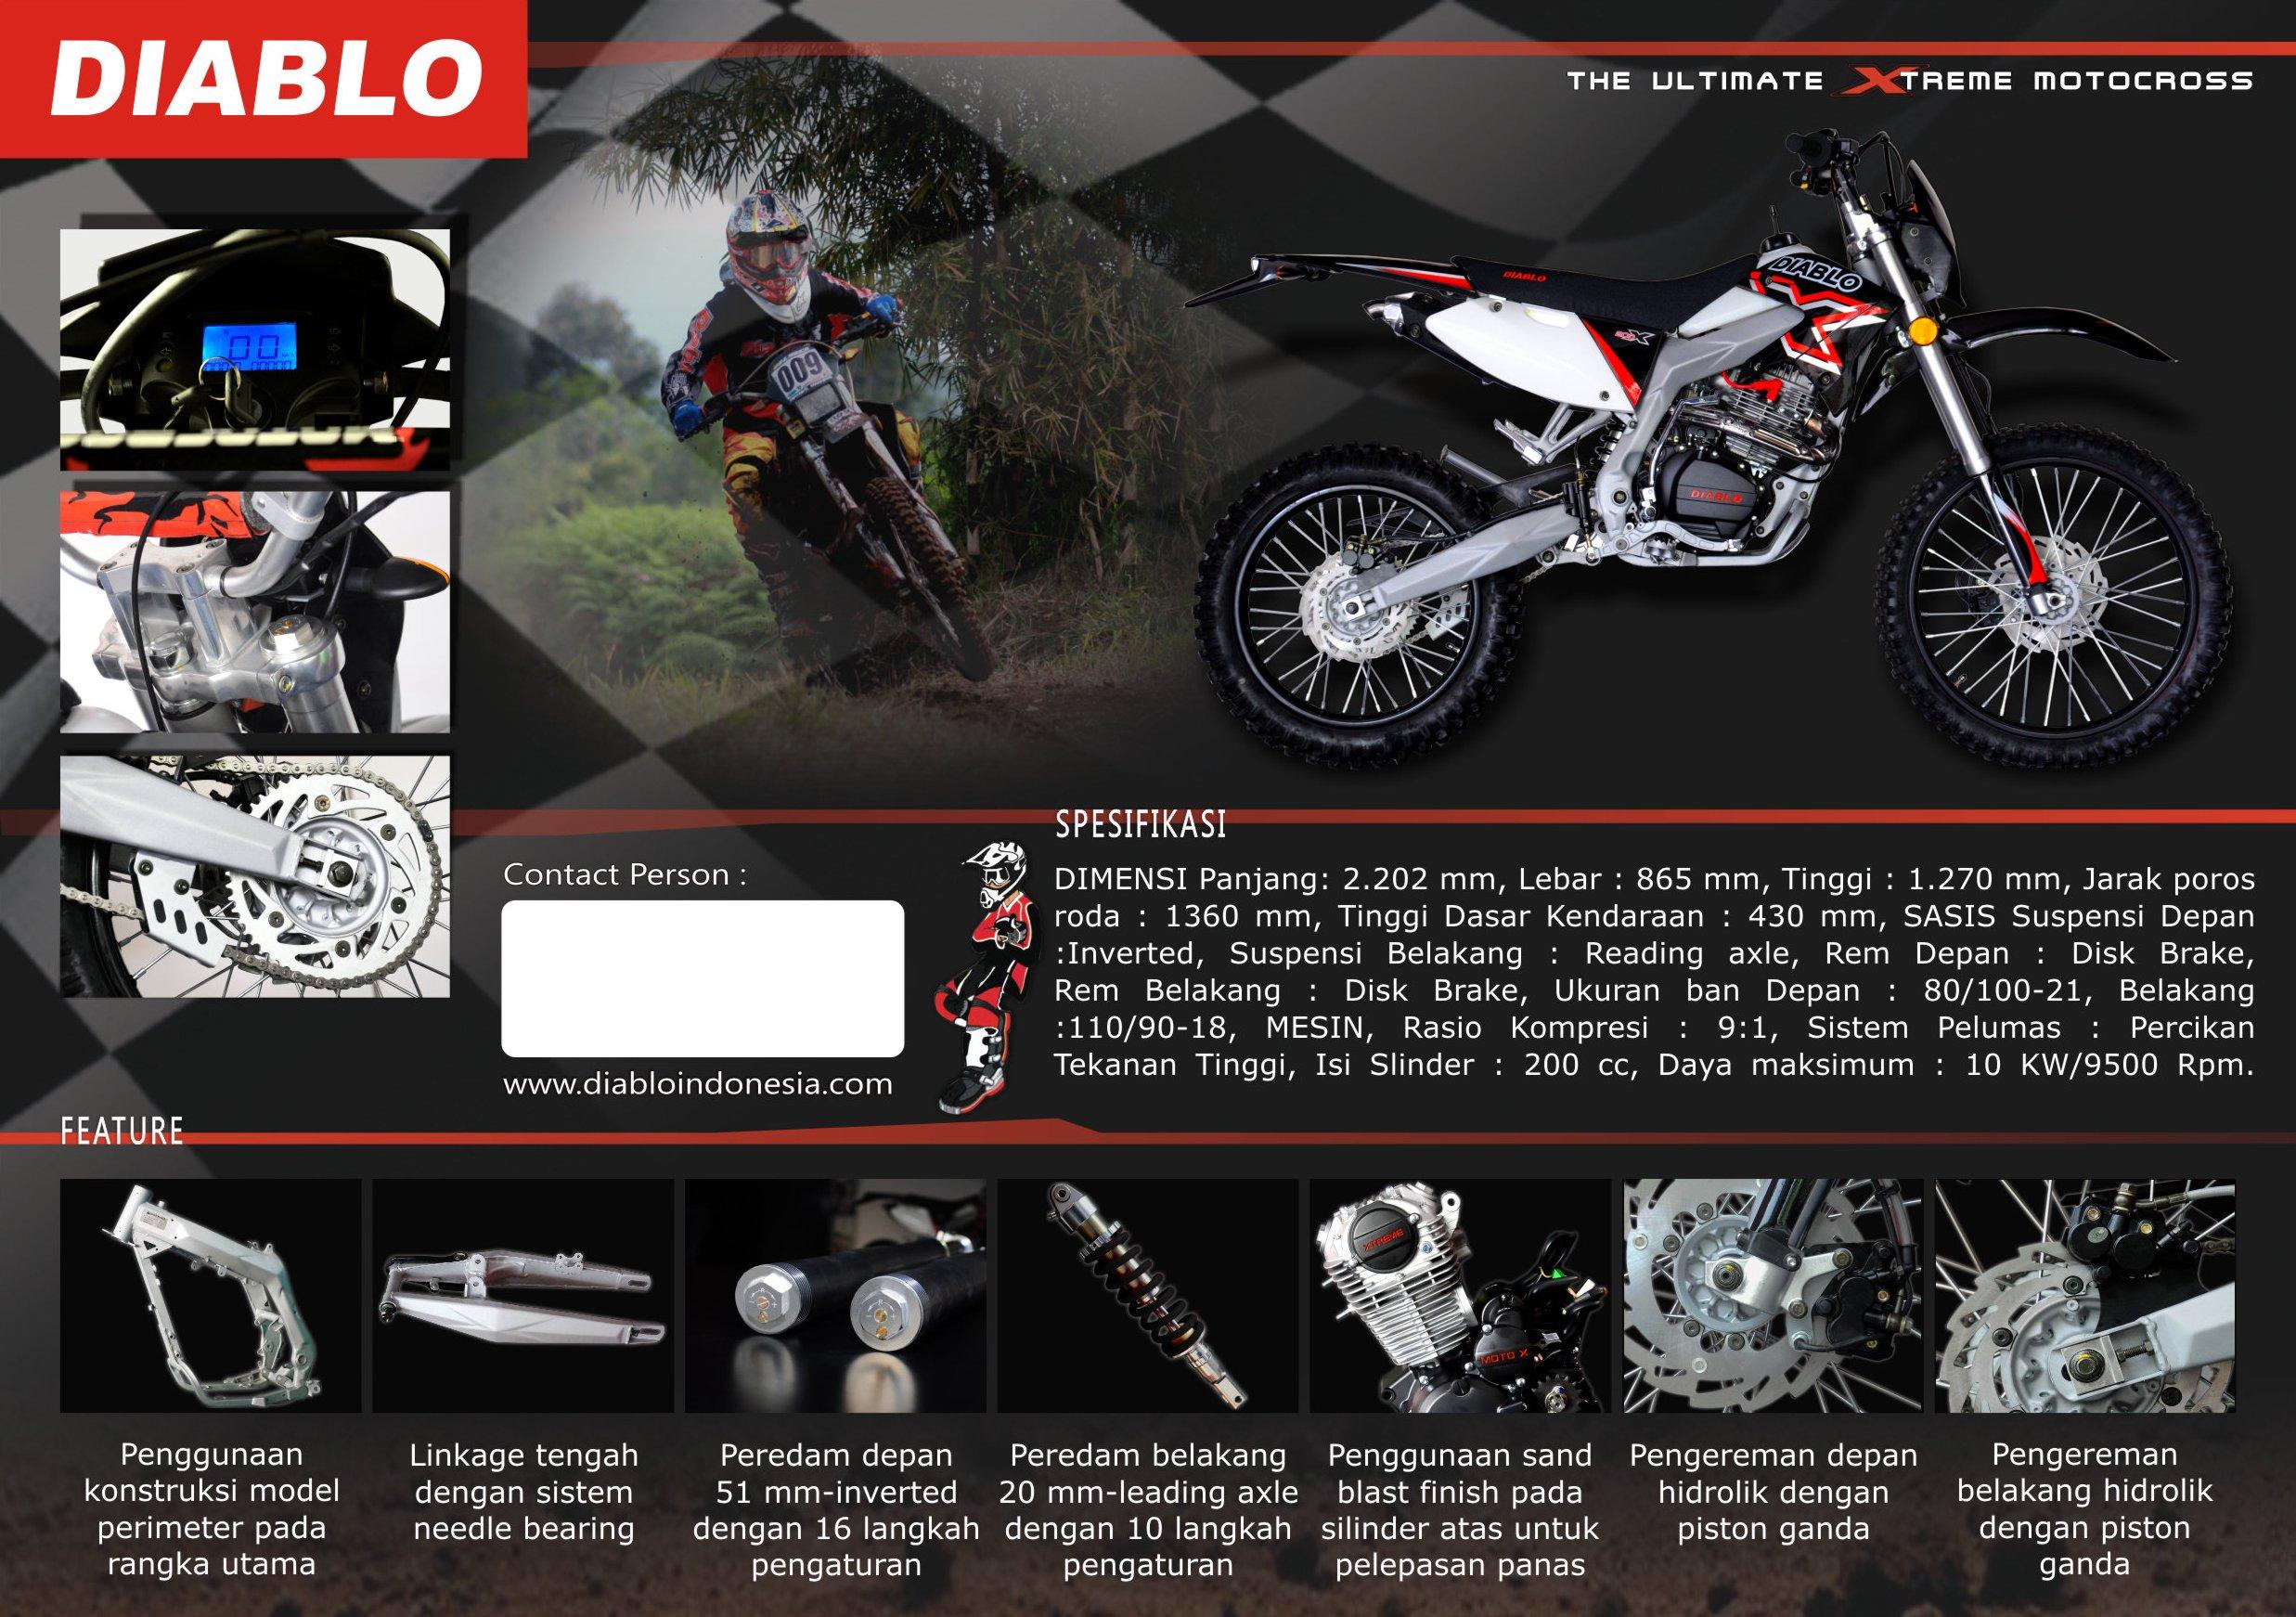 diablo motocross indonesia official site. Black Bedroom Furniture Sets. Home Design Ideas